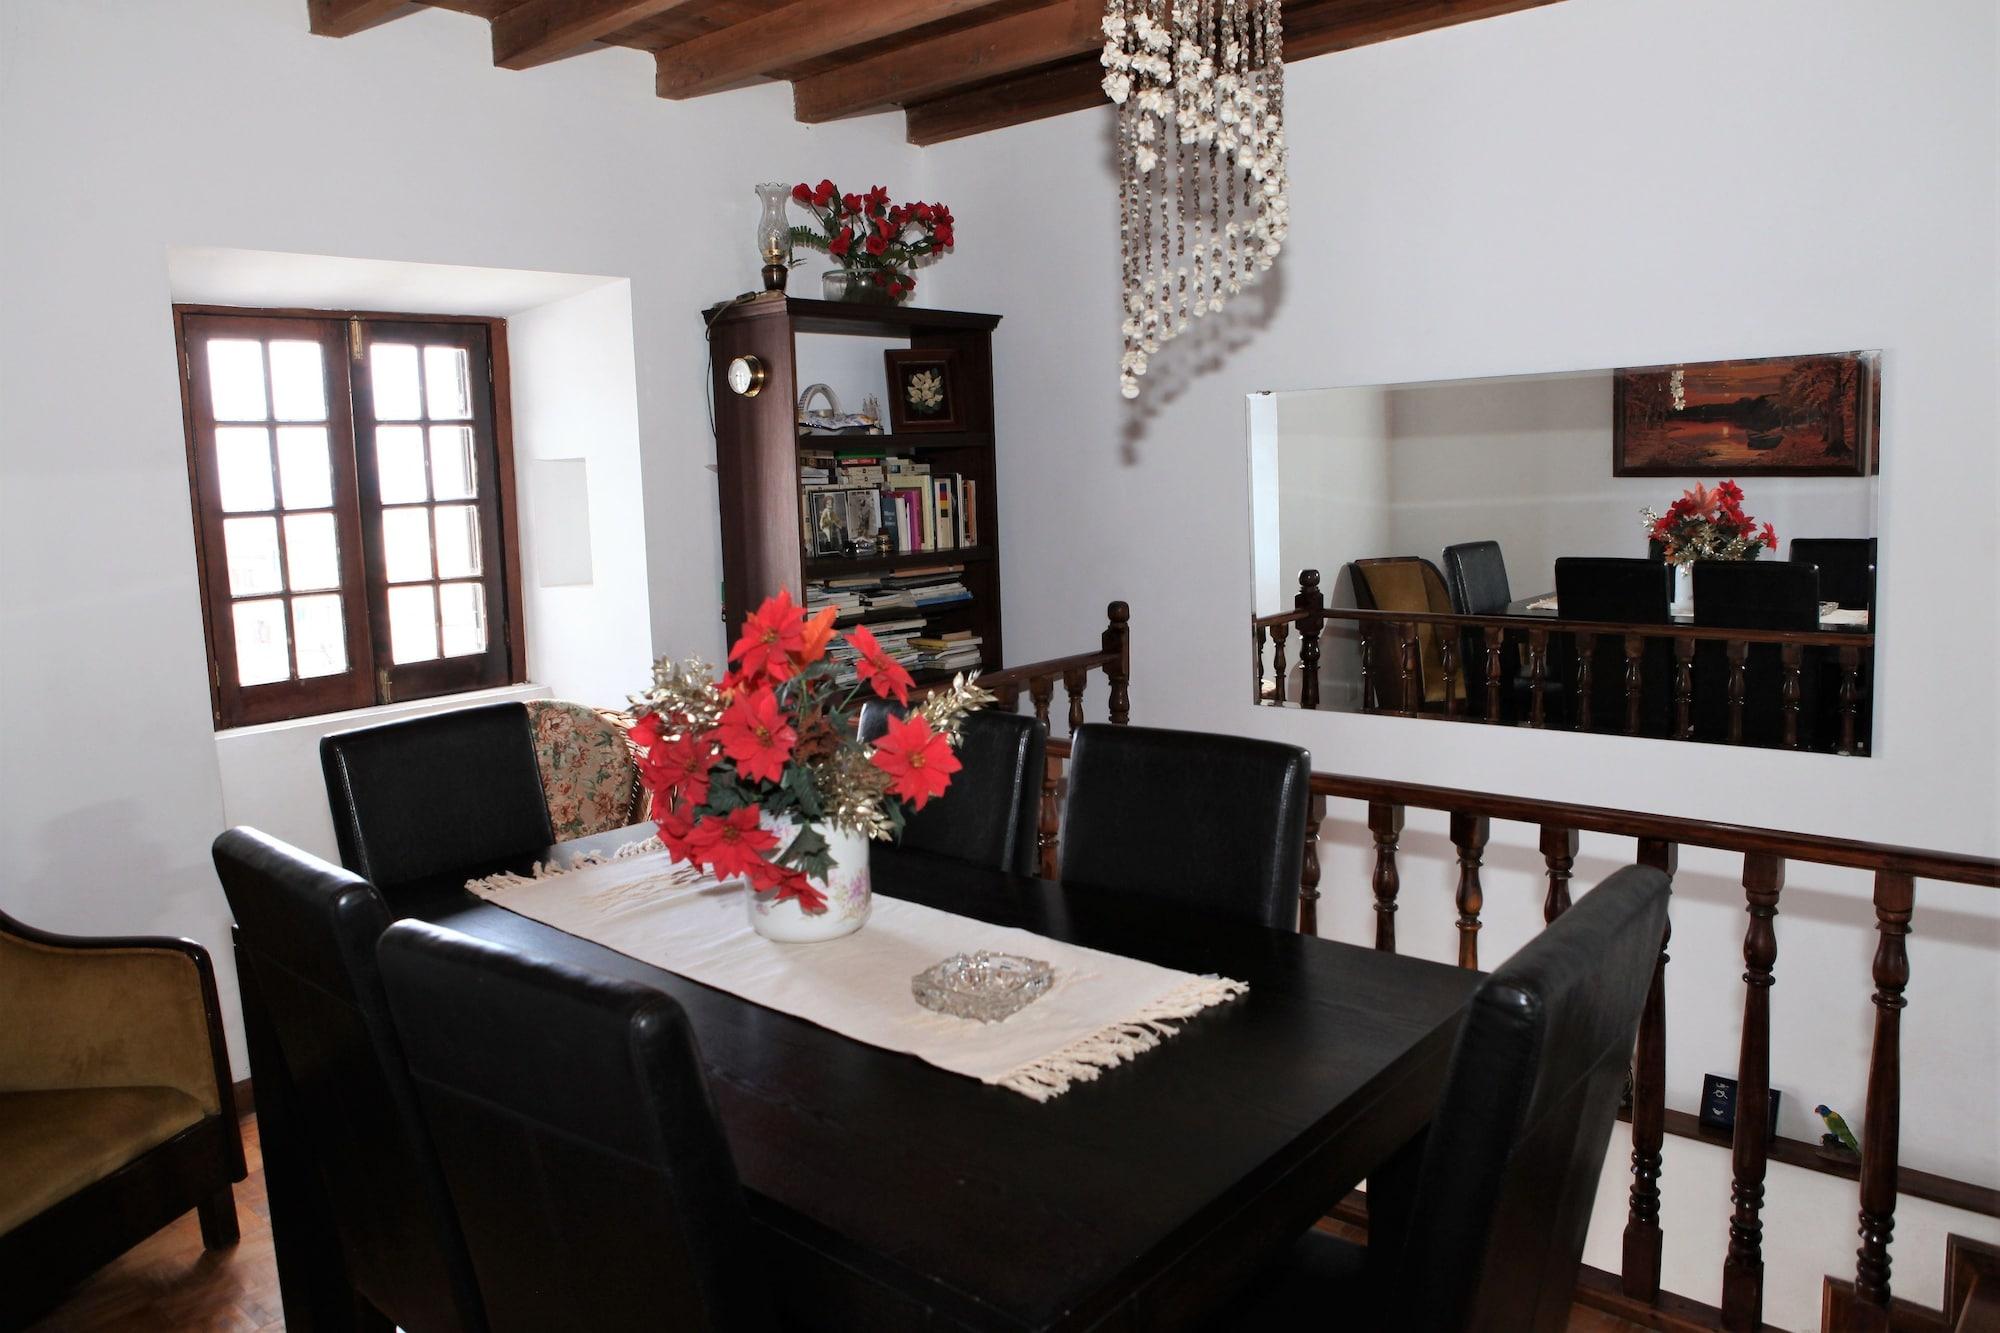 Casa dos Moinhos by Green Vacations, Ribeira Grande